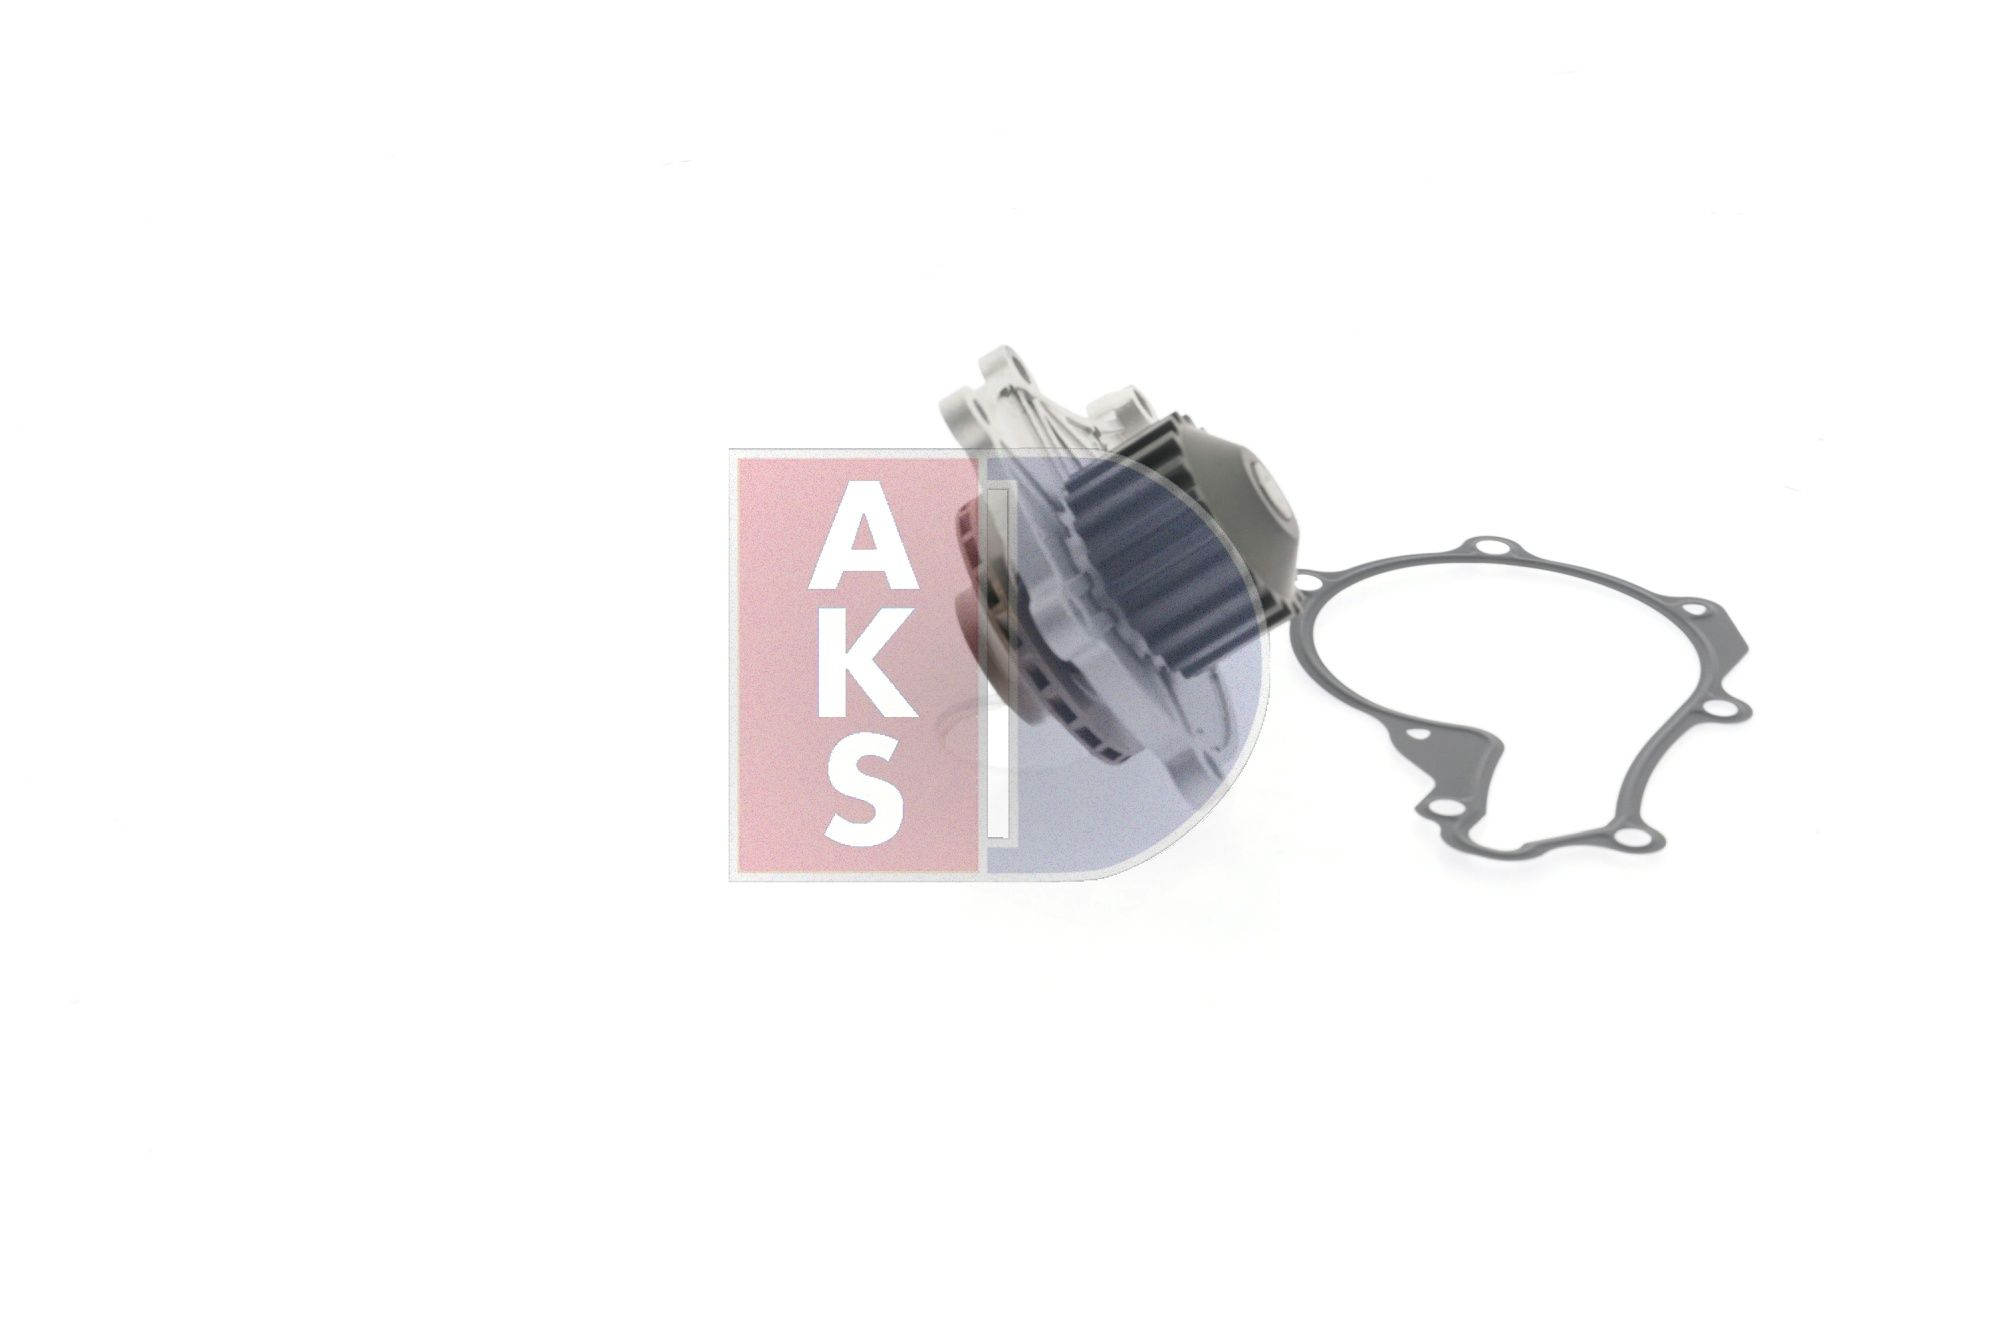 570127N Wasserpumpe AKS DASIS Test